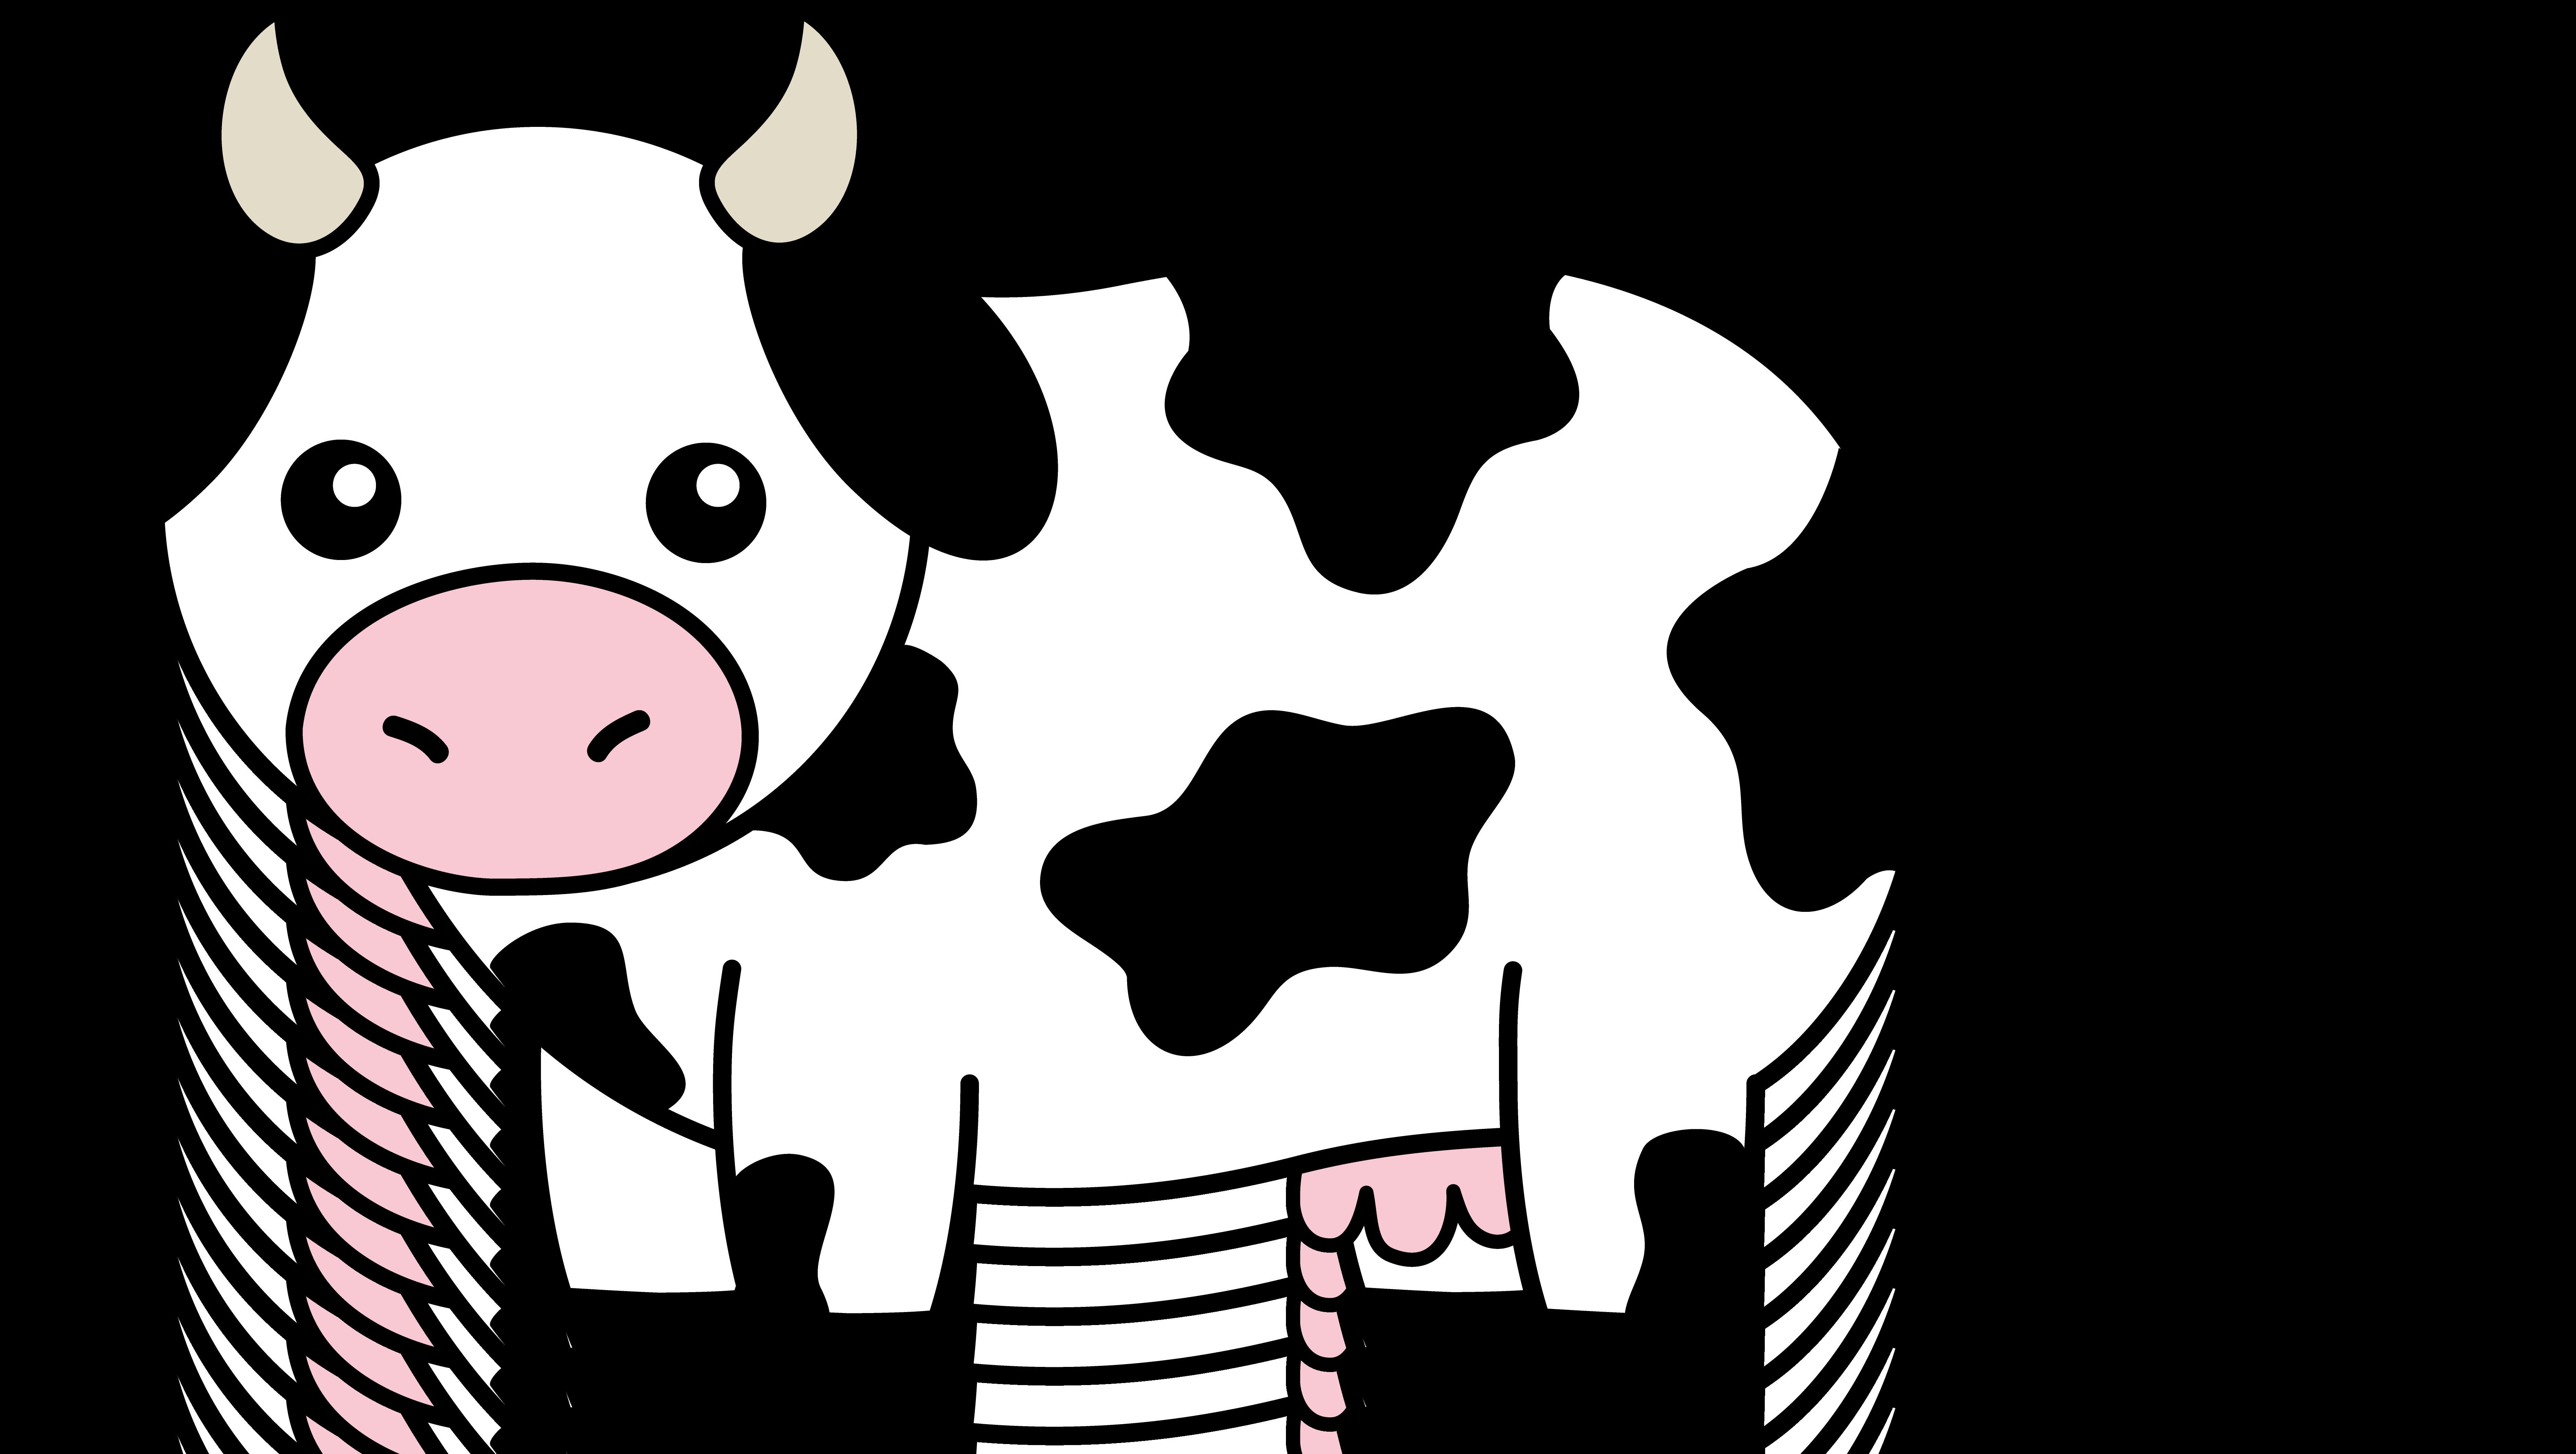 Cattle Clipart-Cattle Clipart-3